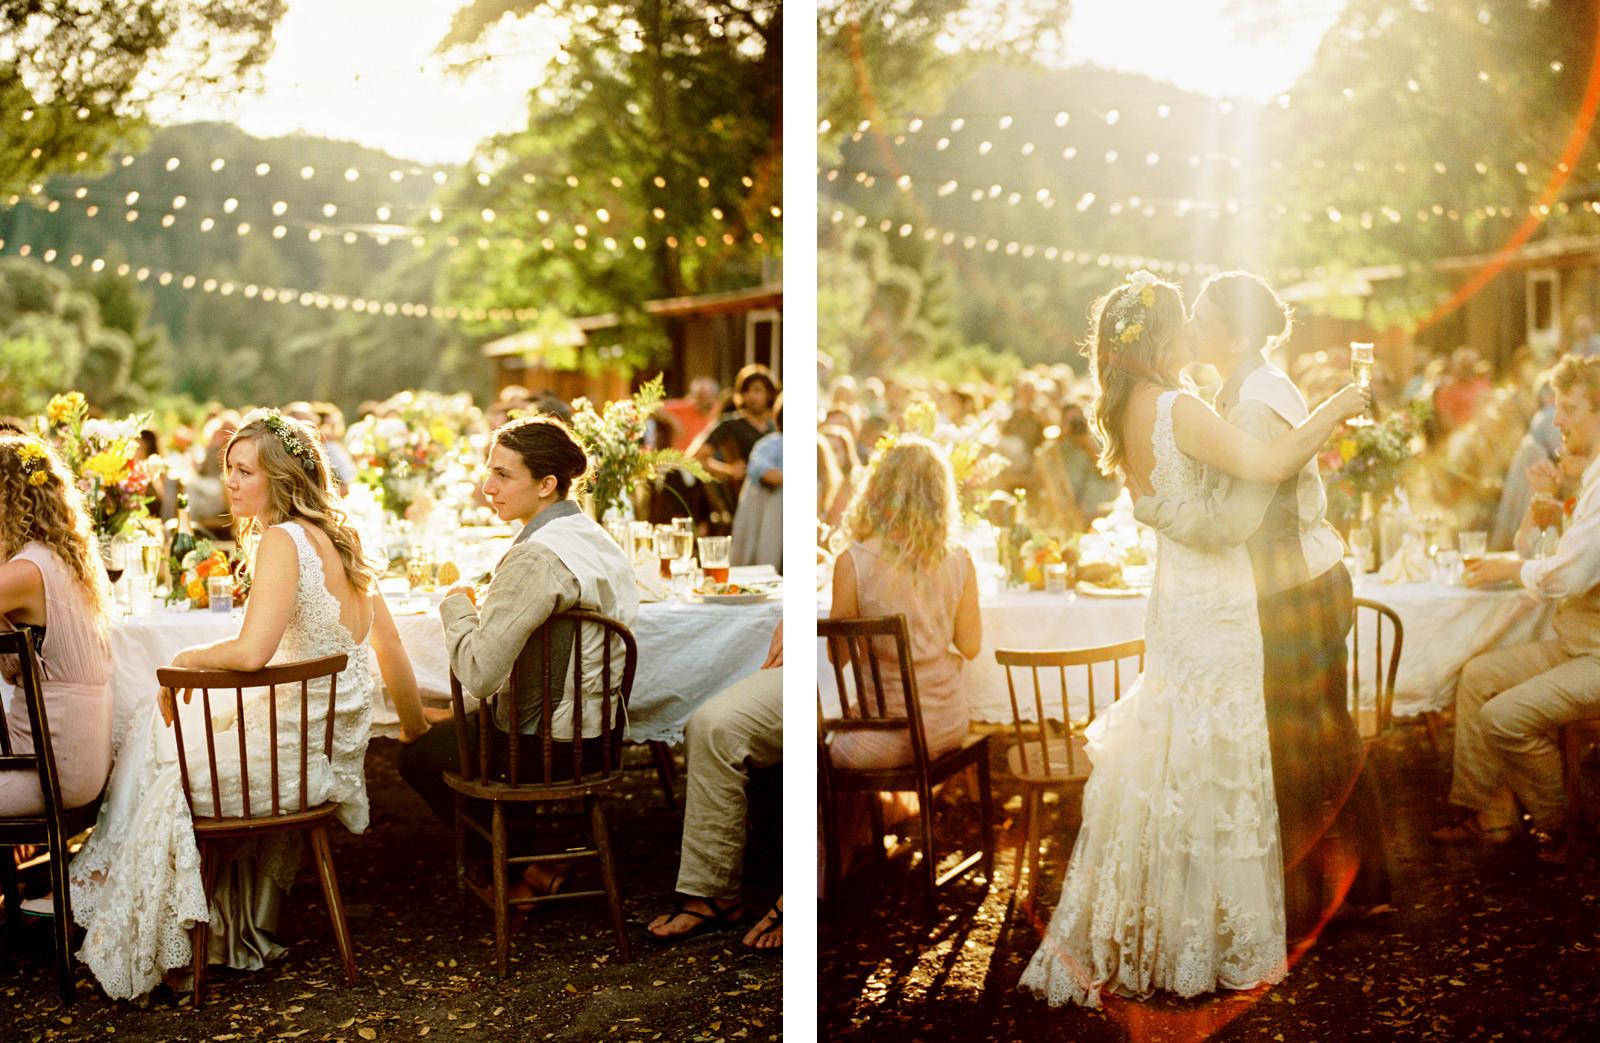 rivers-bend-retreat-wedding-078 RIVER'S BEND RETREAT WEDDING